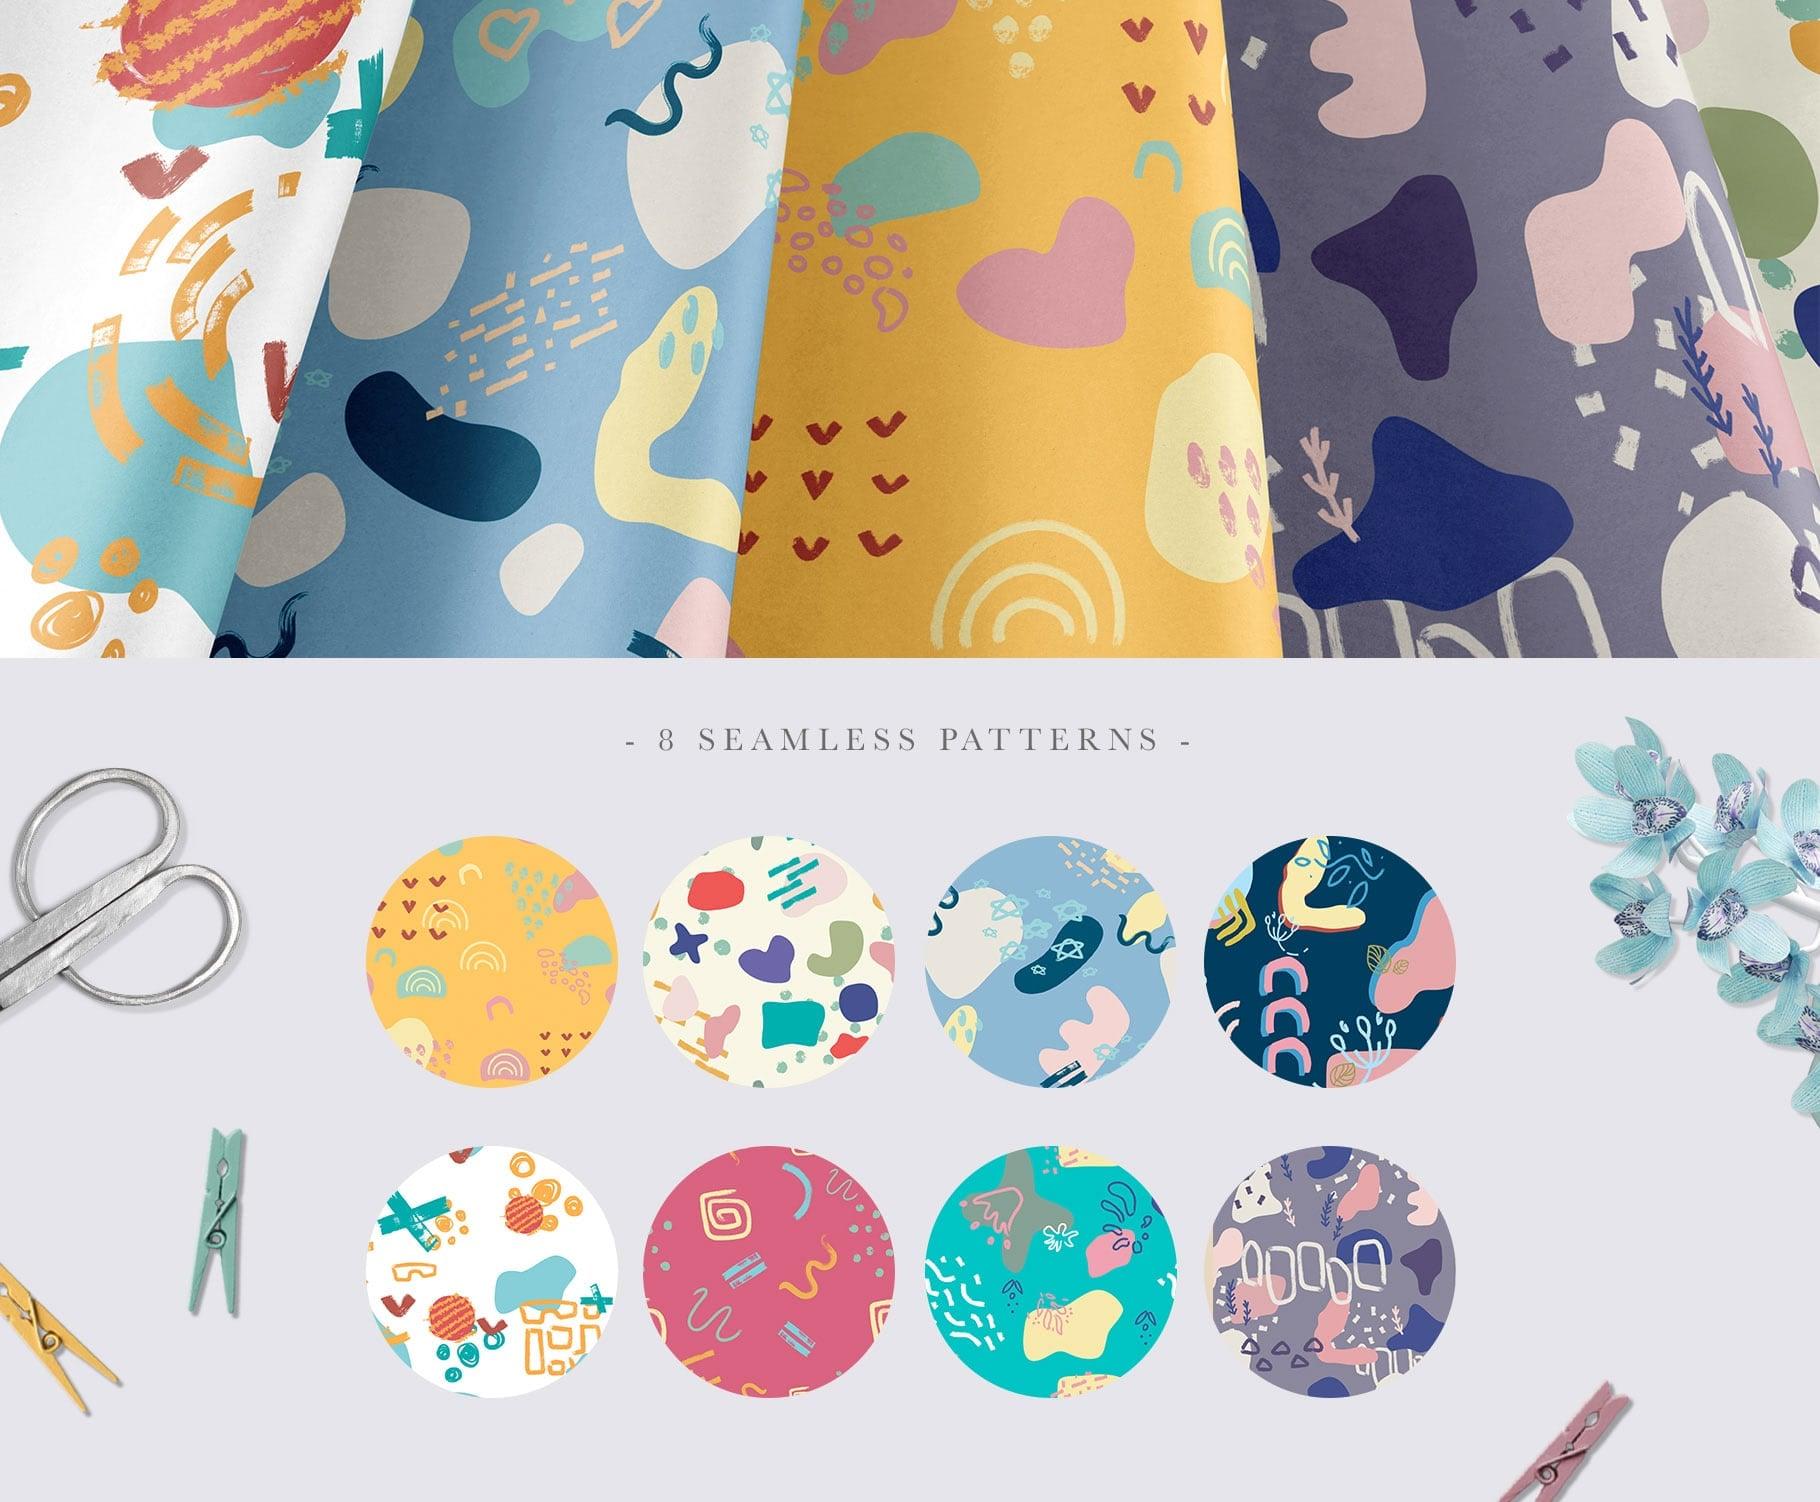 La Liberte Creative Set (Abstract Shapes and Elements) - $15 - Prev6 min